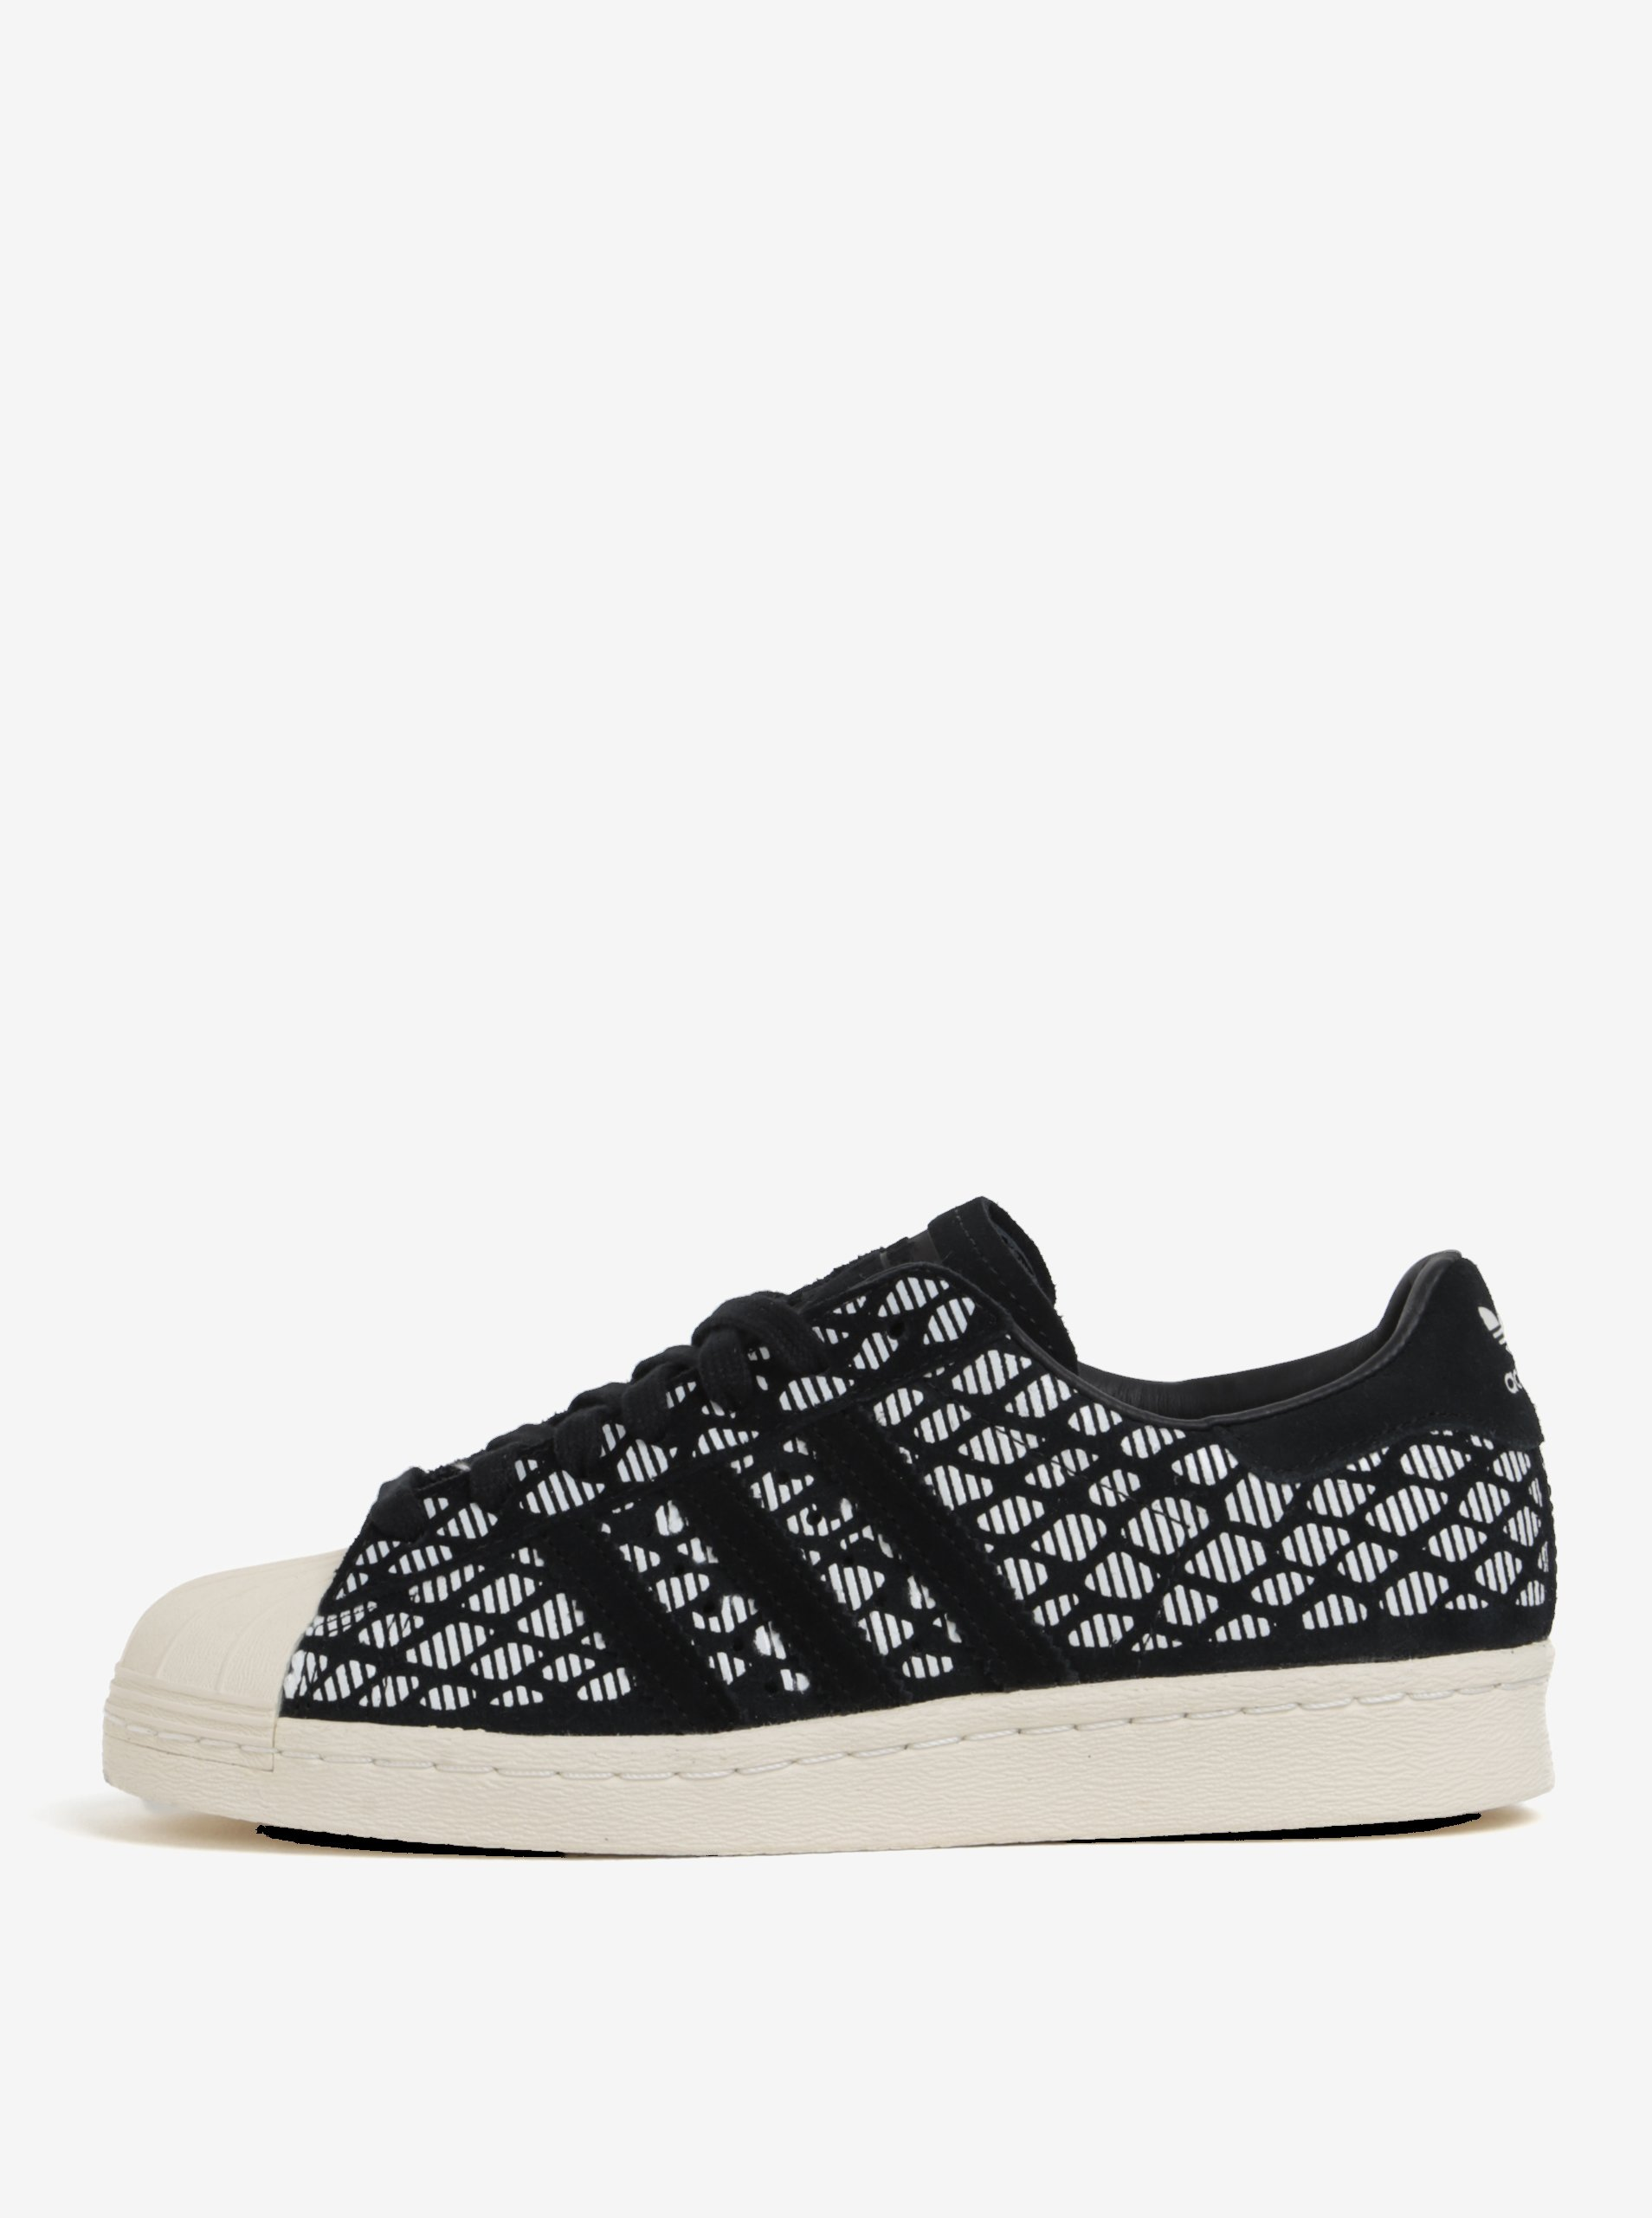 a6a91737c4c9 Bielo-čierne dámske semišové tenisky adidas Originals Superstar